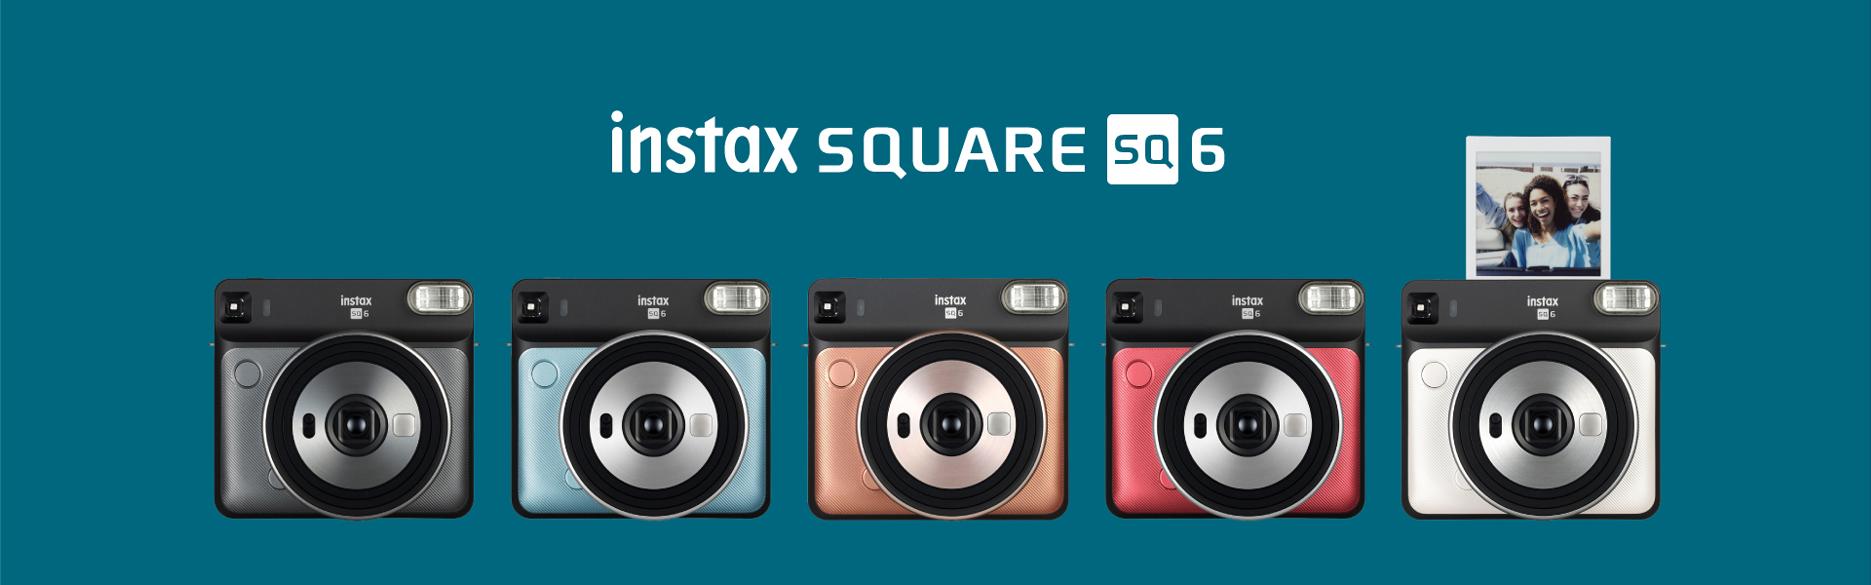 [image] instax SQUARE SQ6